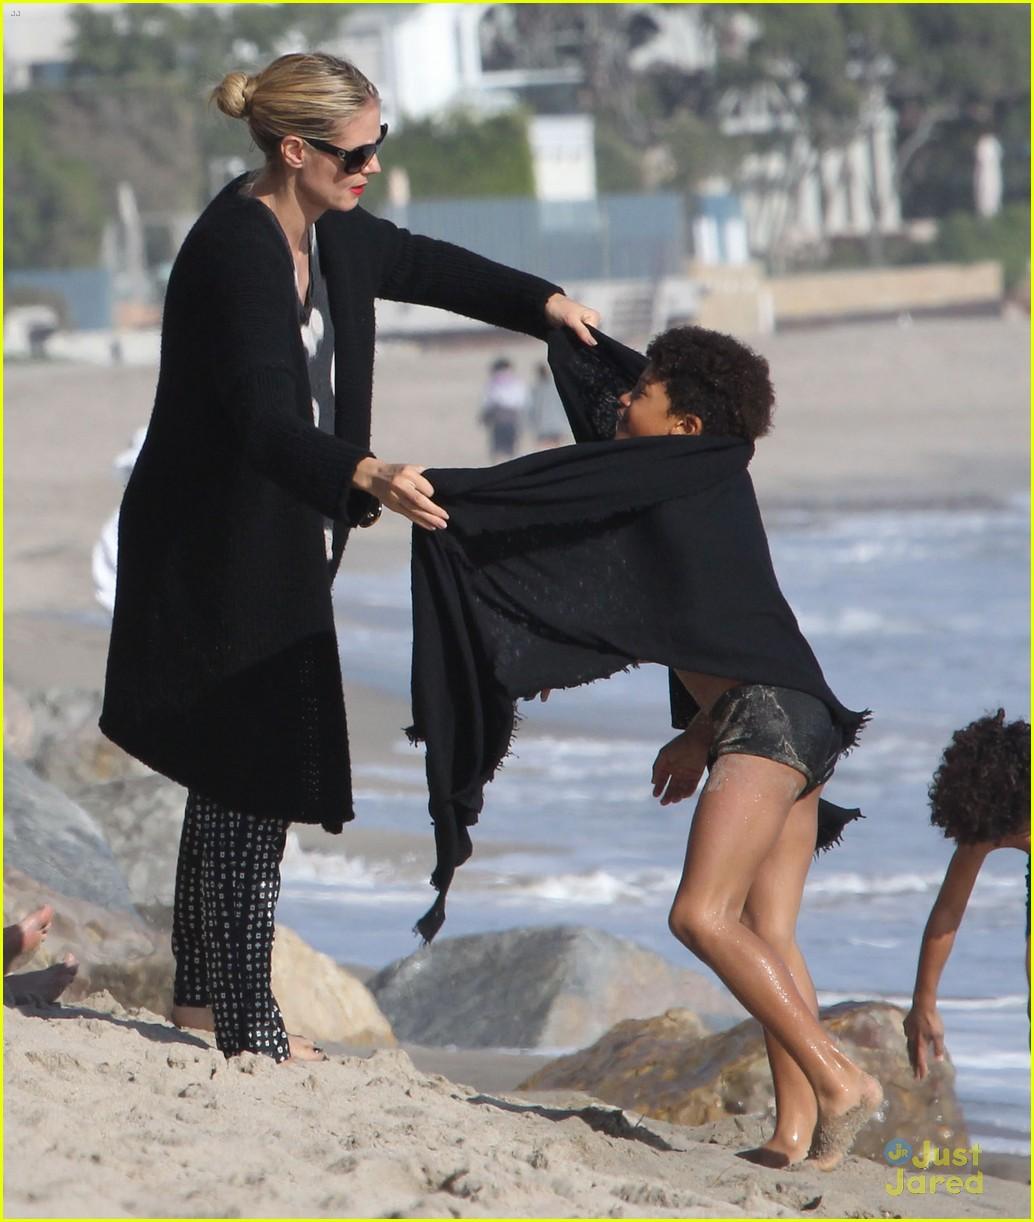 heidi klum martin kirsten beach day with the kids 252814915